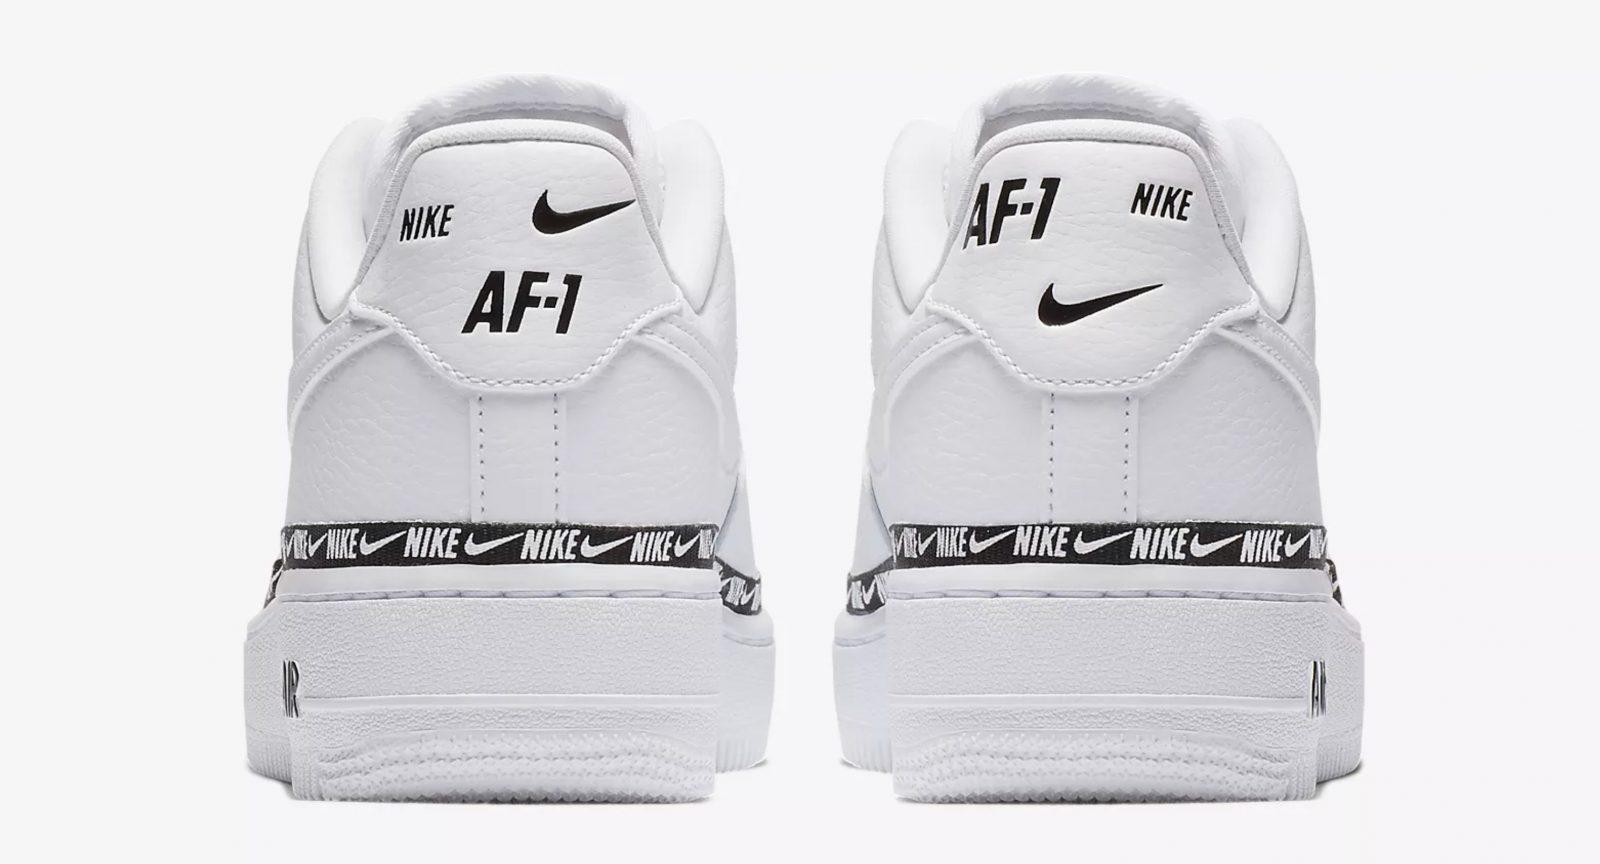 Nike Air Force 1 '07 SE Premium Ribbon Pack AH6827 101Eneste kvinder AH6827 101 The Sole Womens